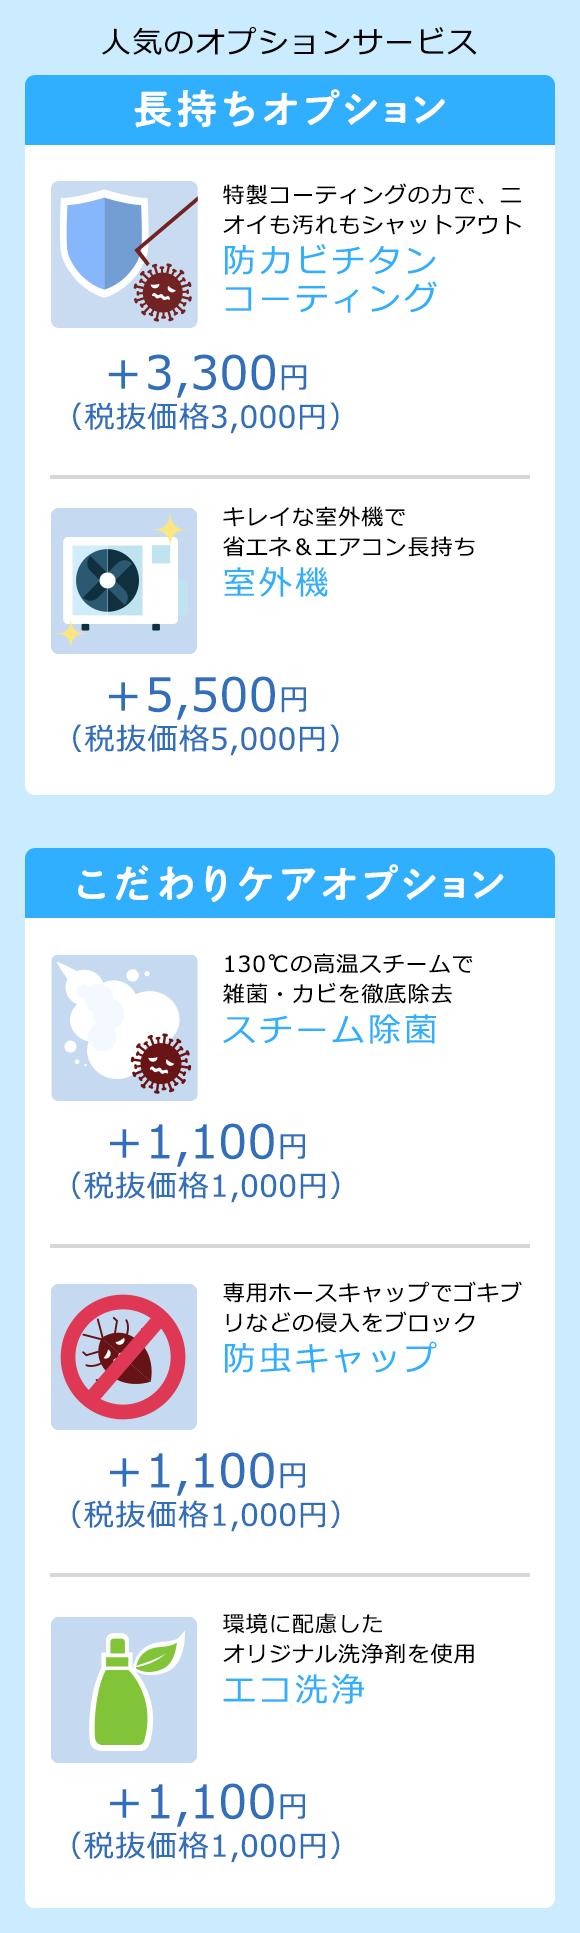 sp_2103aircon_11